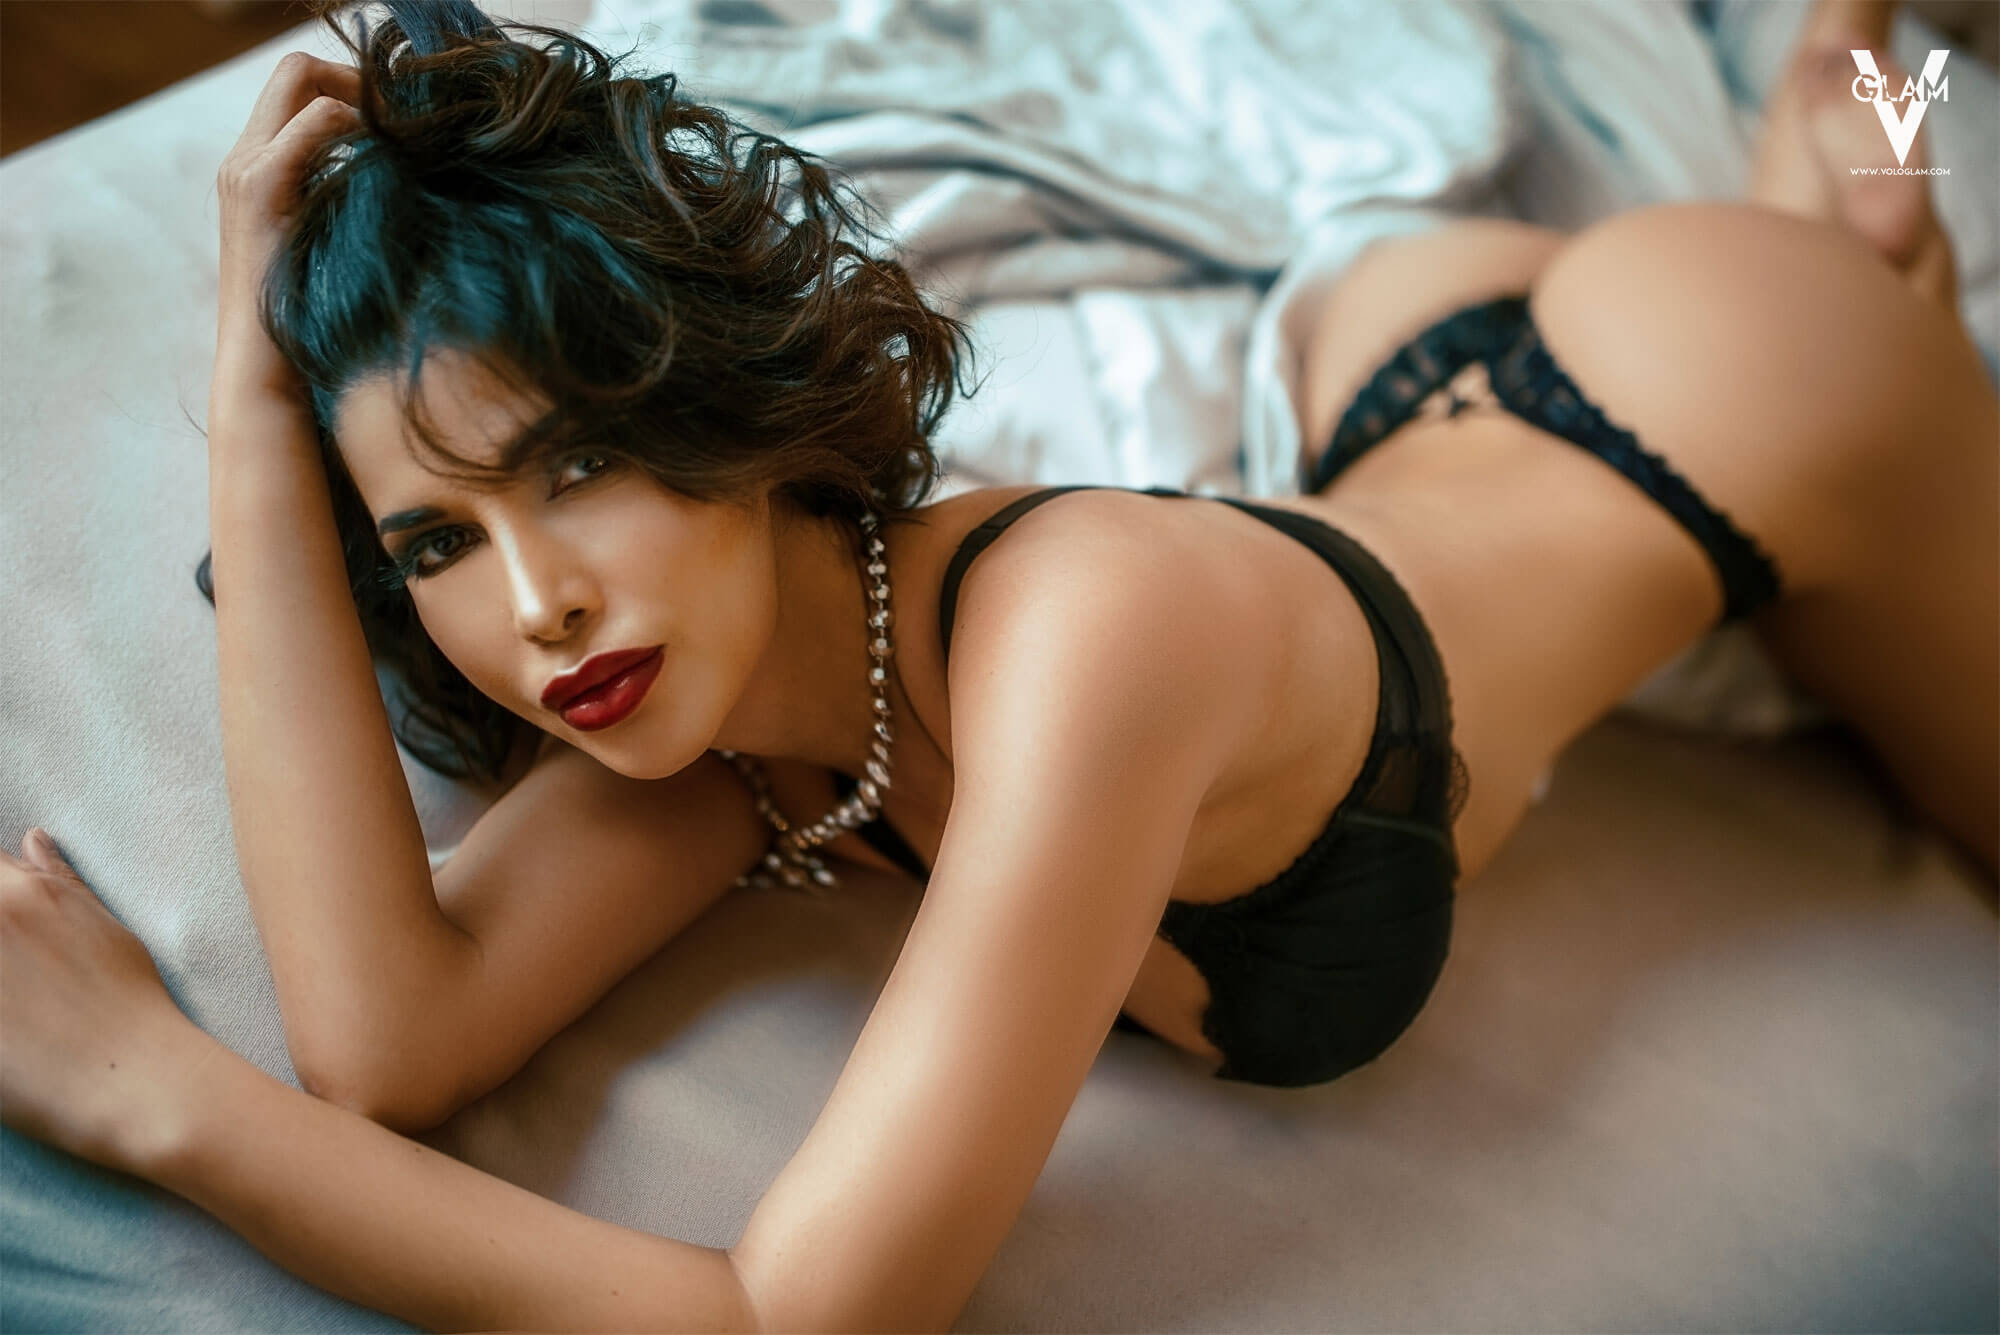 Eniko mihalik nude sexy 9 Photos